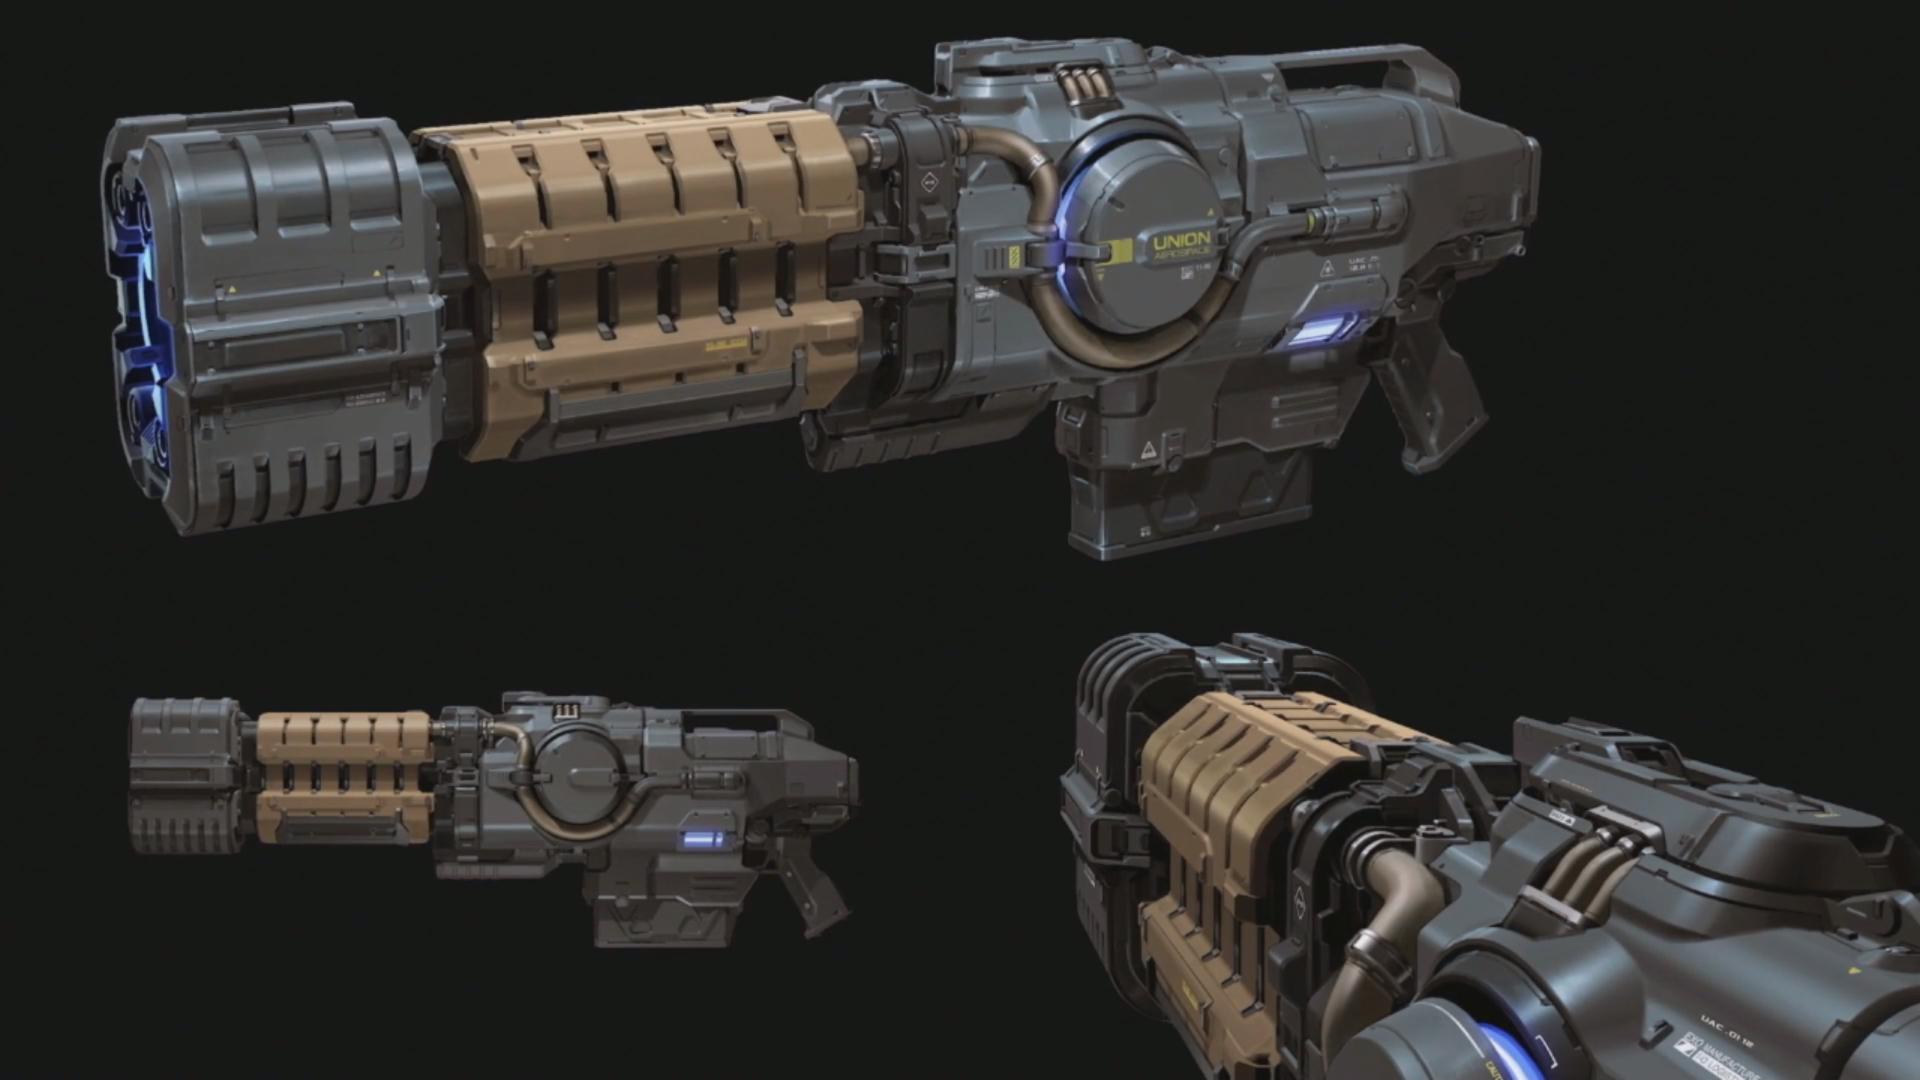 https://www.pcgamesn.com/wp-content/uploads/2018/08/Doom-Eternal-Plasma-Gun.jpg